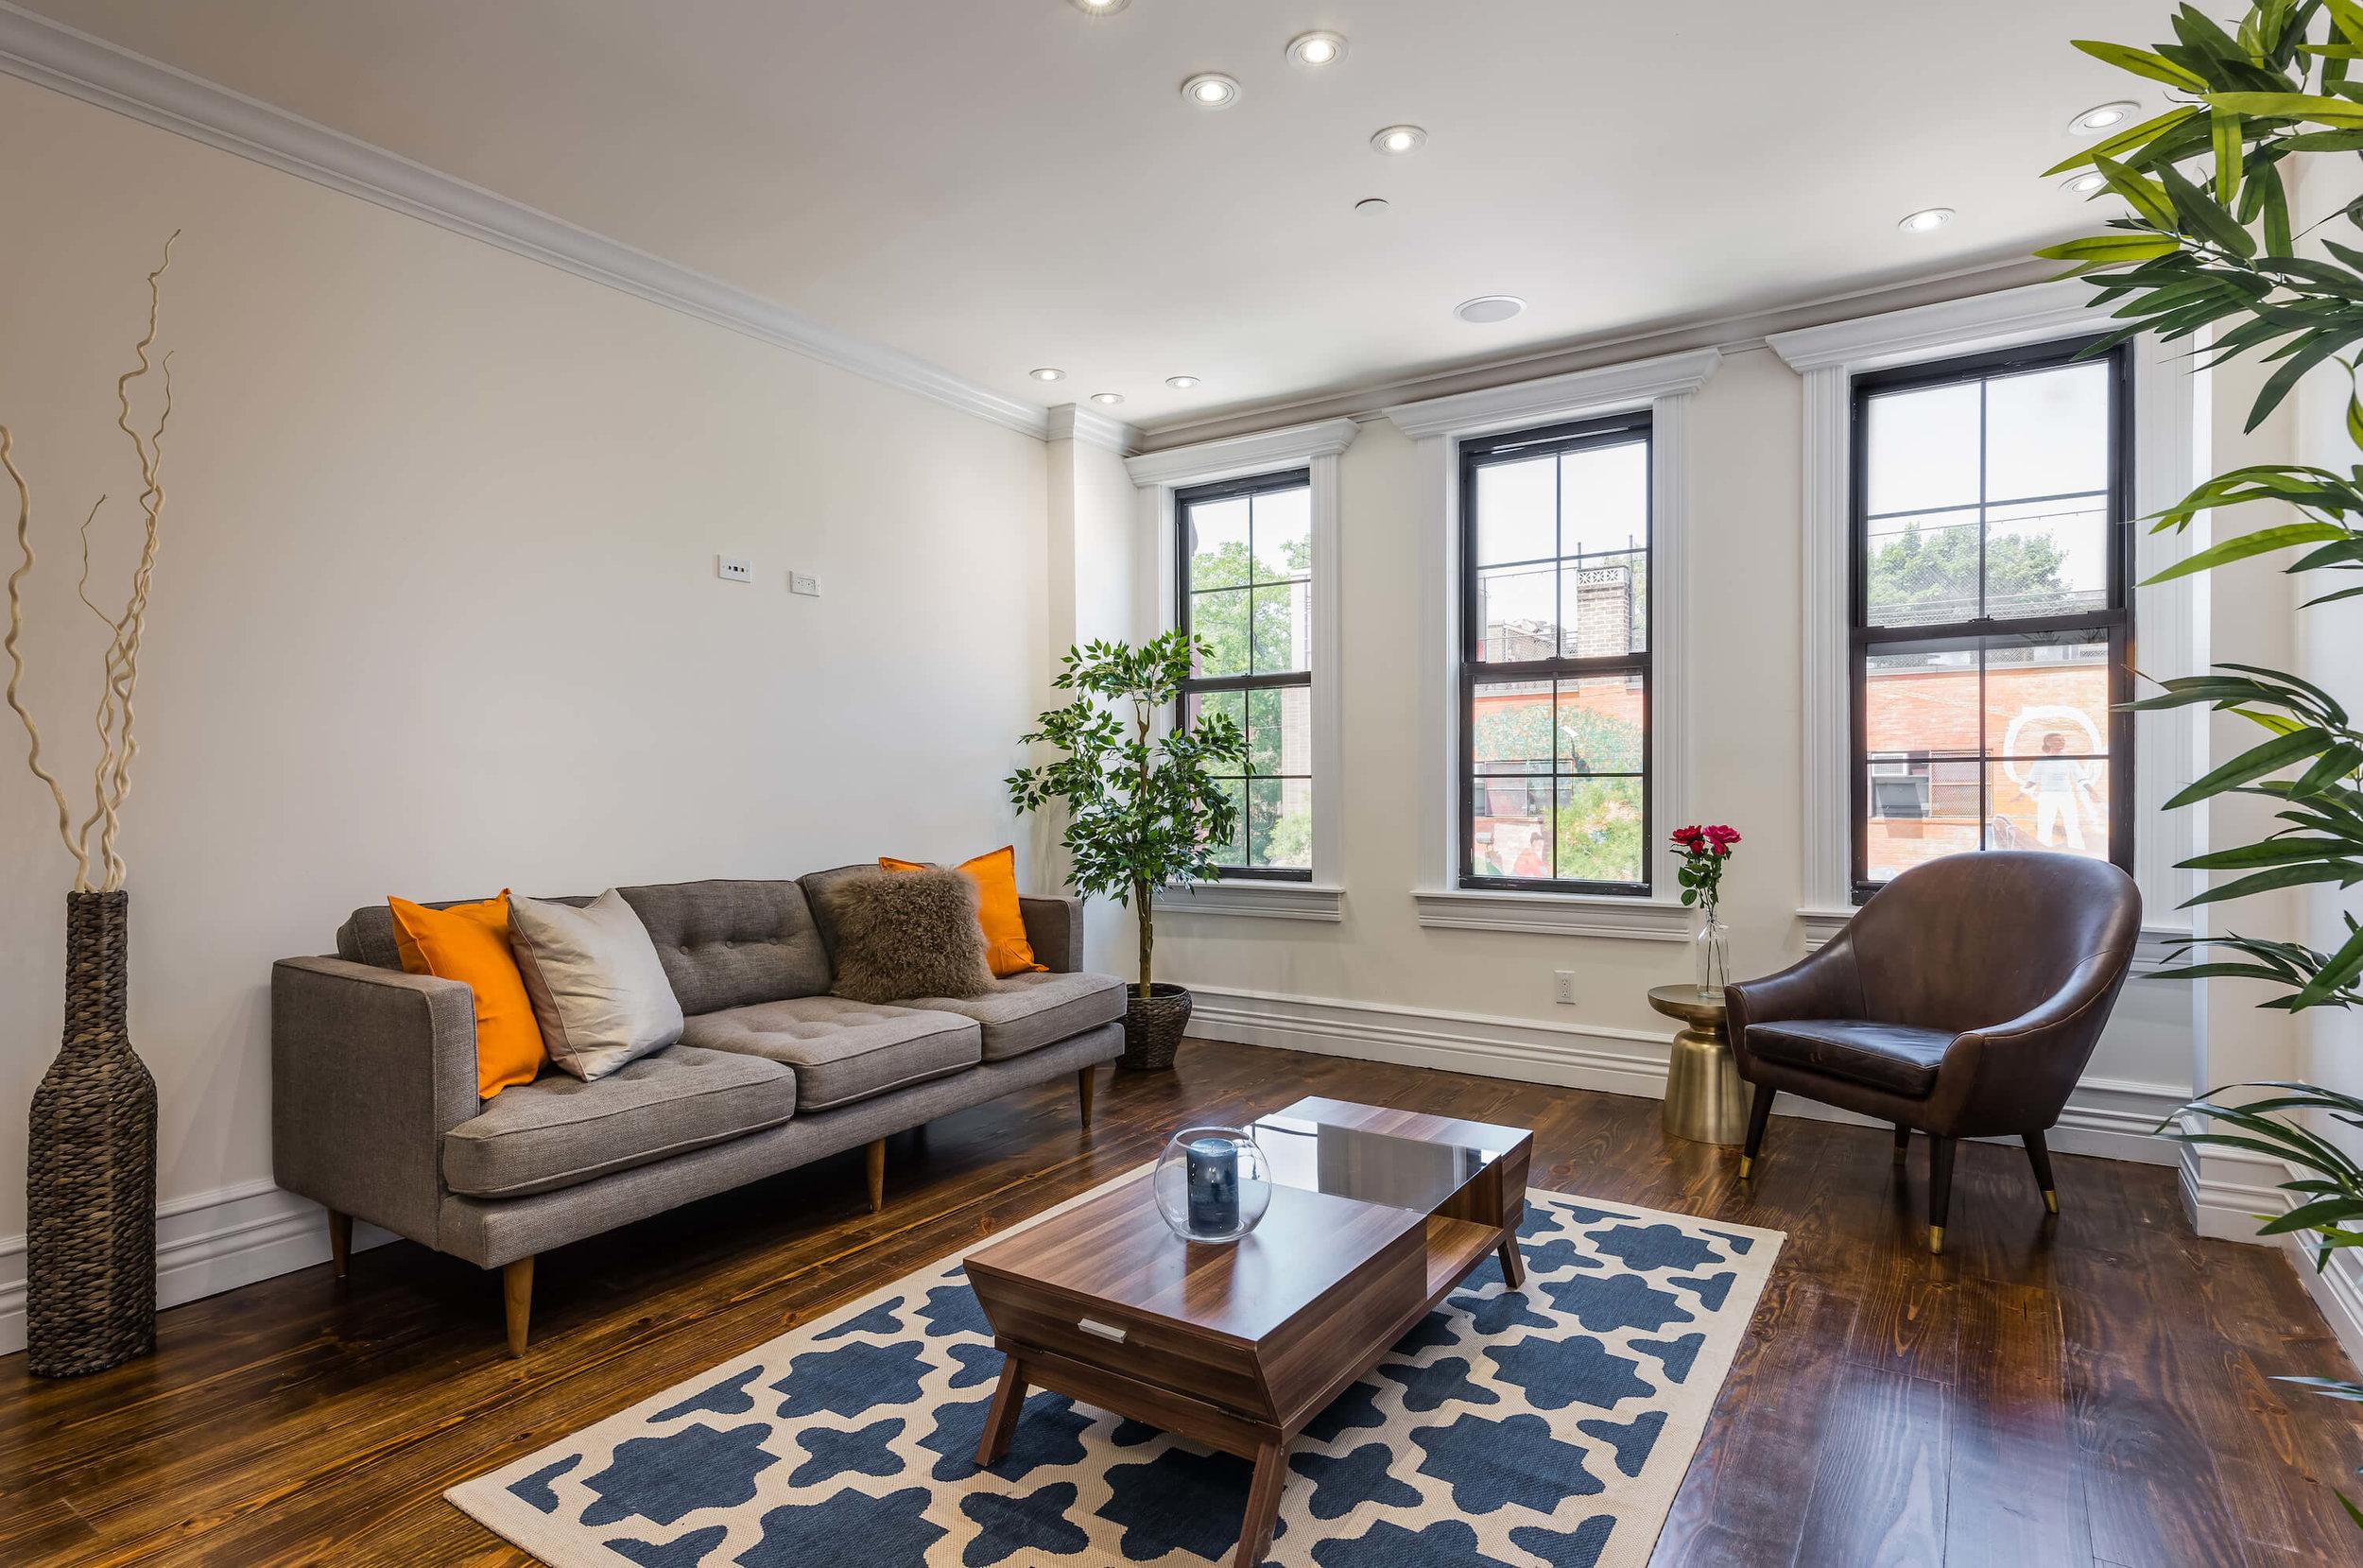 Plush, Well-Lit Living Room